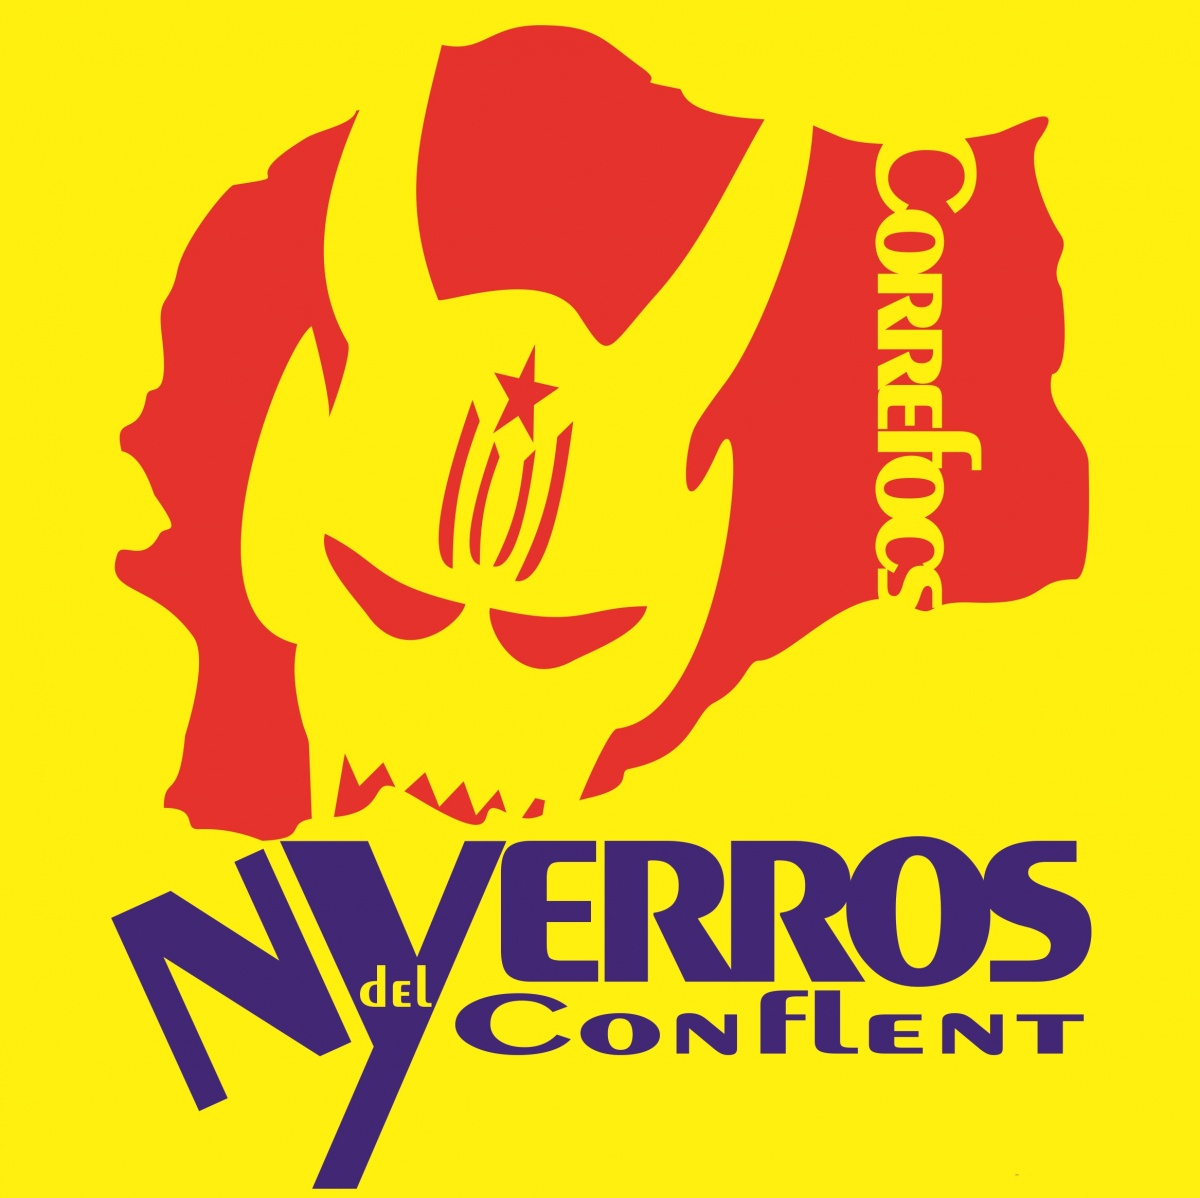 logo_nyerros_del_conflent